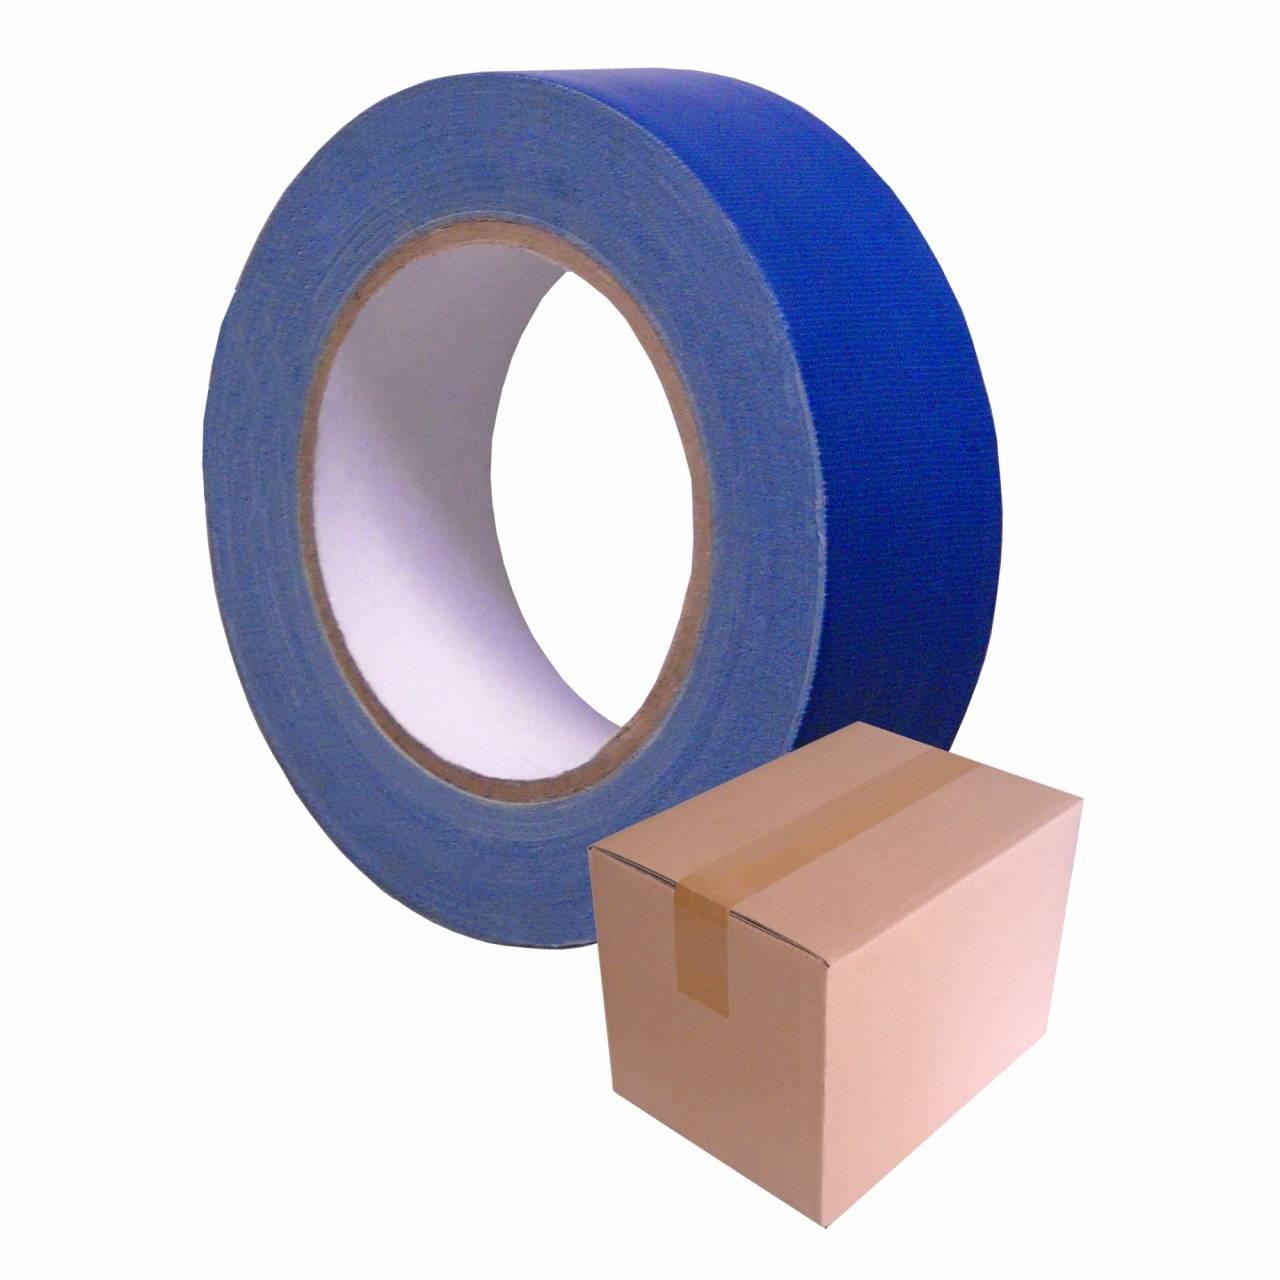 Gewebe-Klebeband T104 UV-blau, 38 mm x 25 m / Krt a 32 Rollen